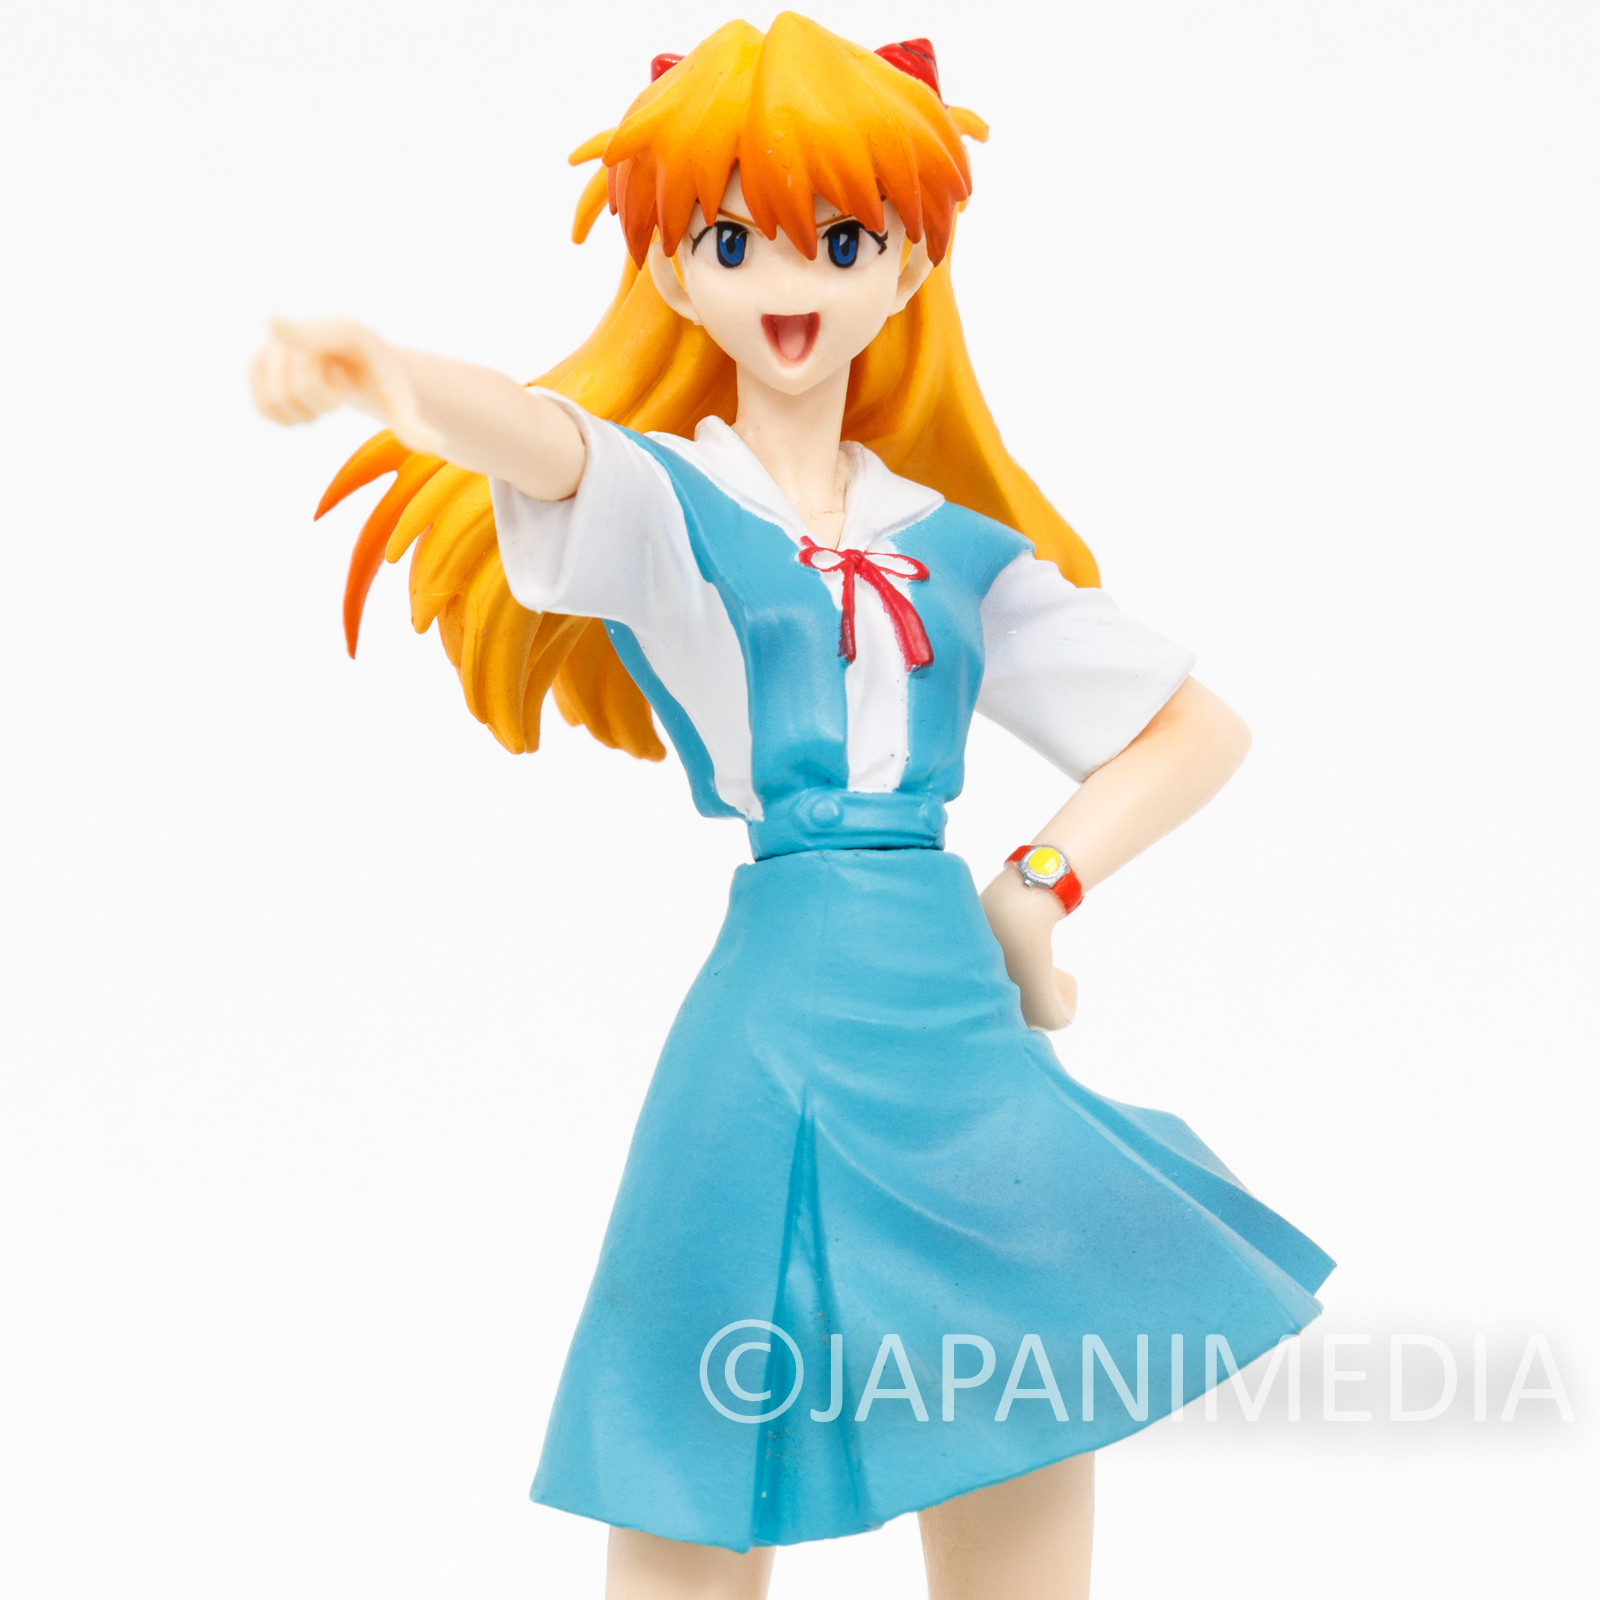 Evangelion Asuka Langley School Costume Portraits Figure Series 9 BANDAI JAPAN